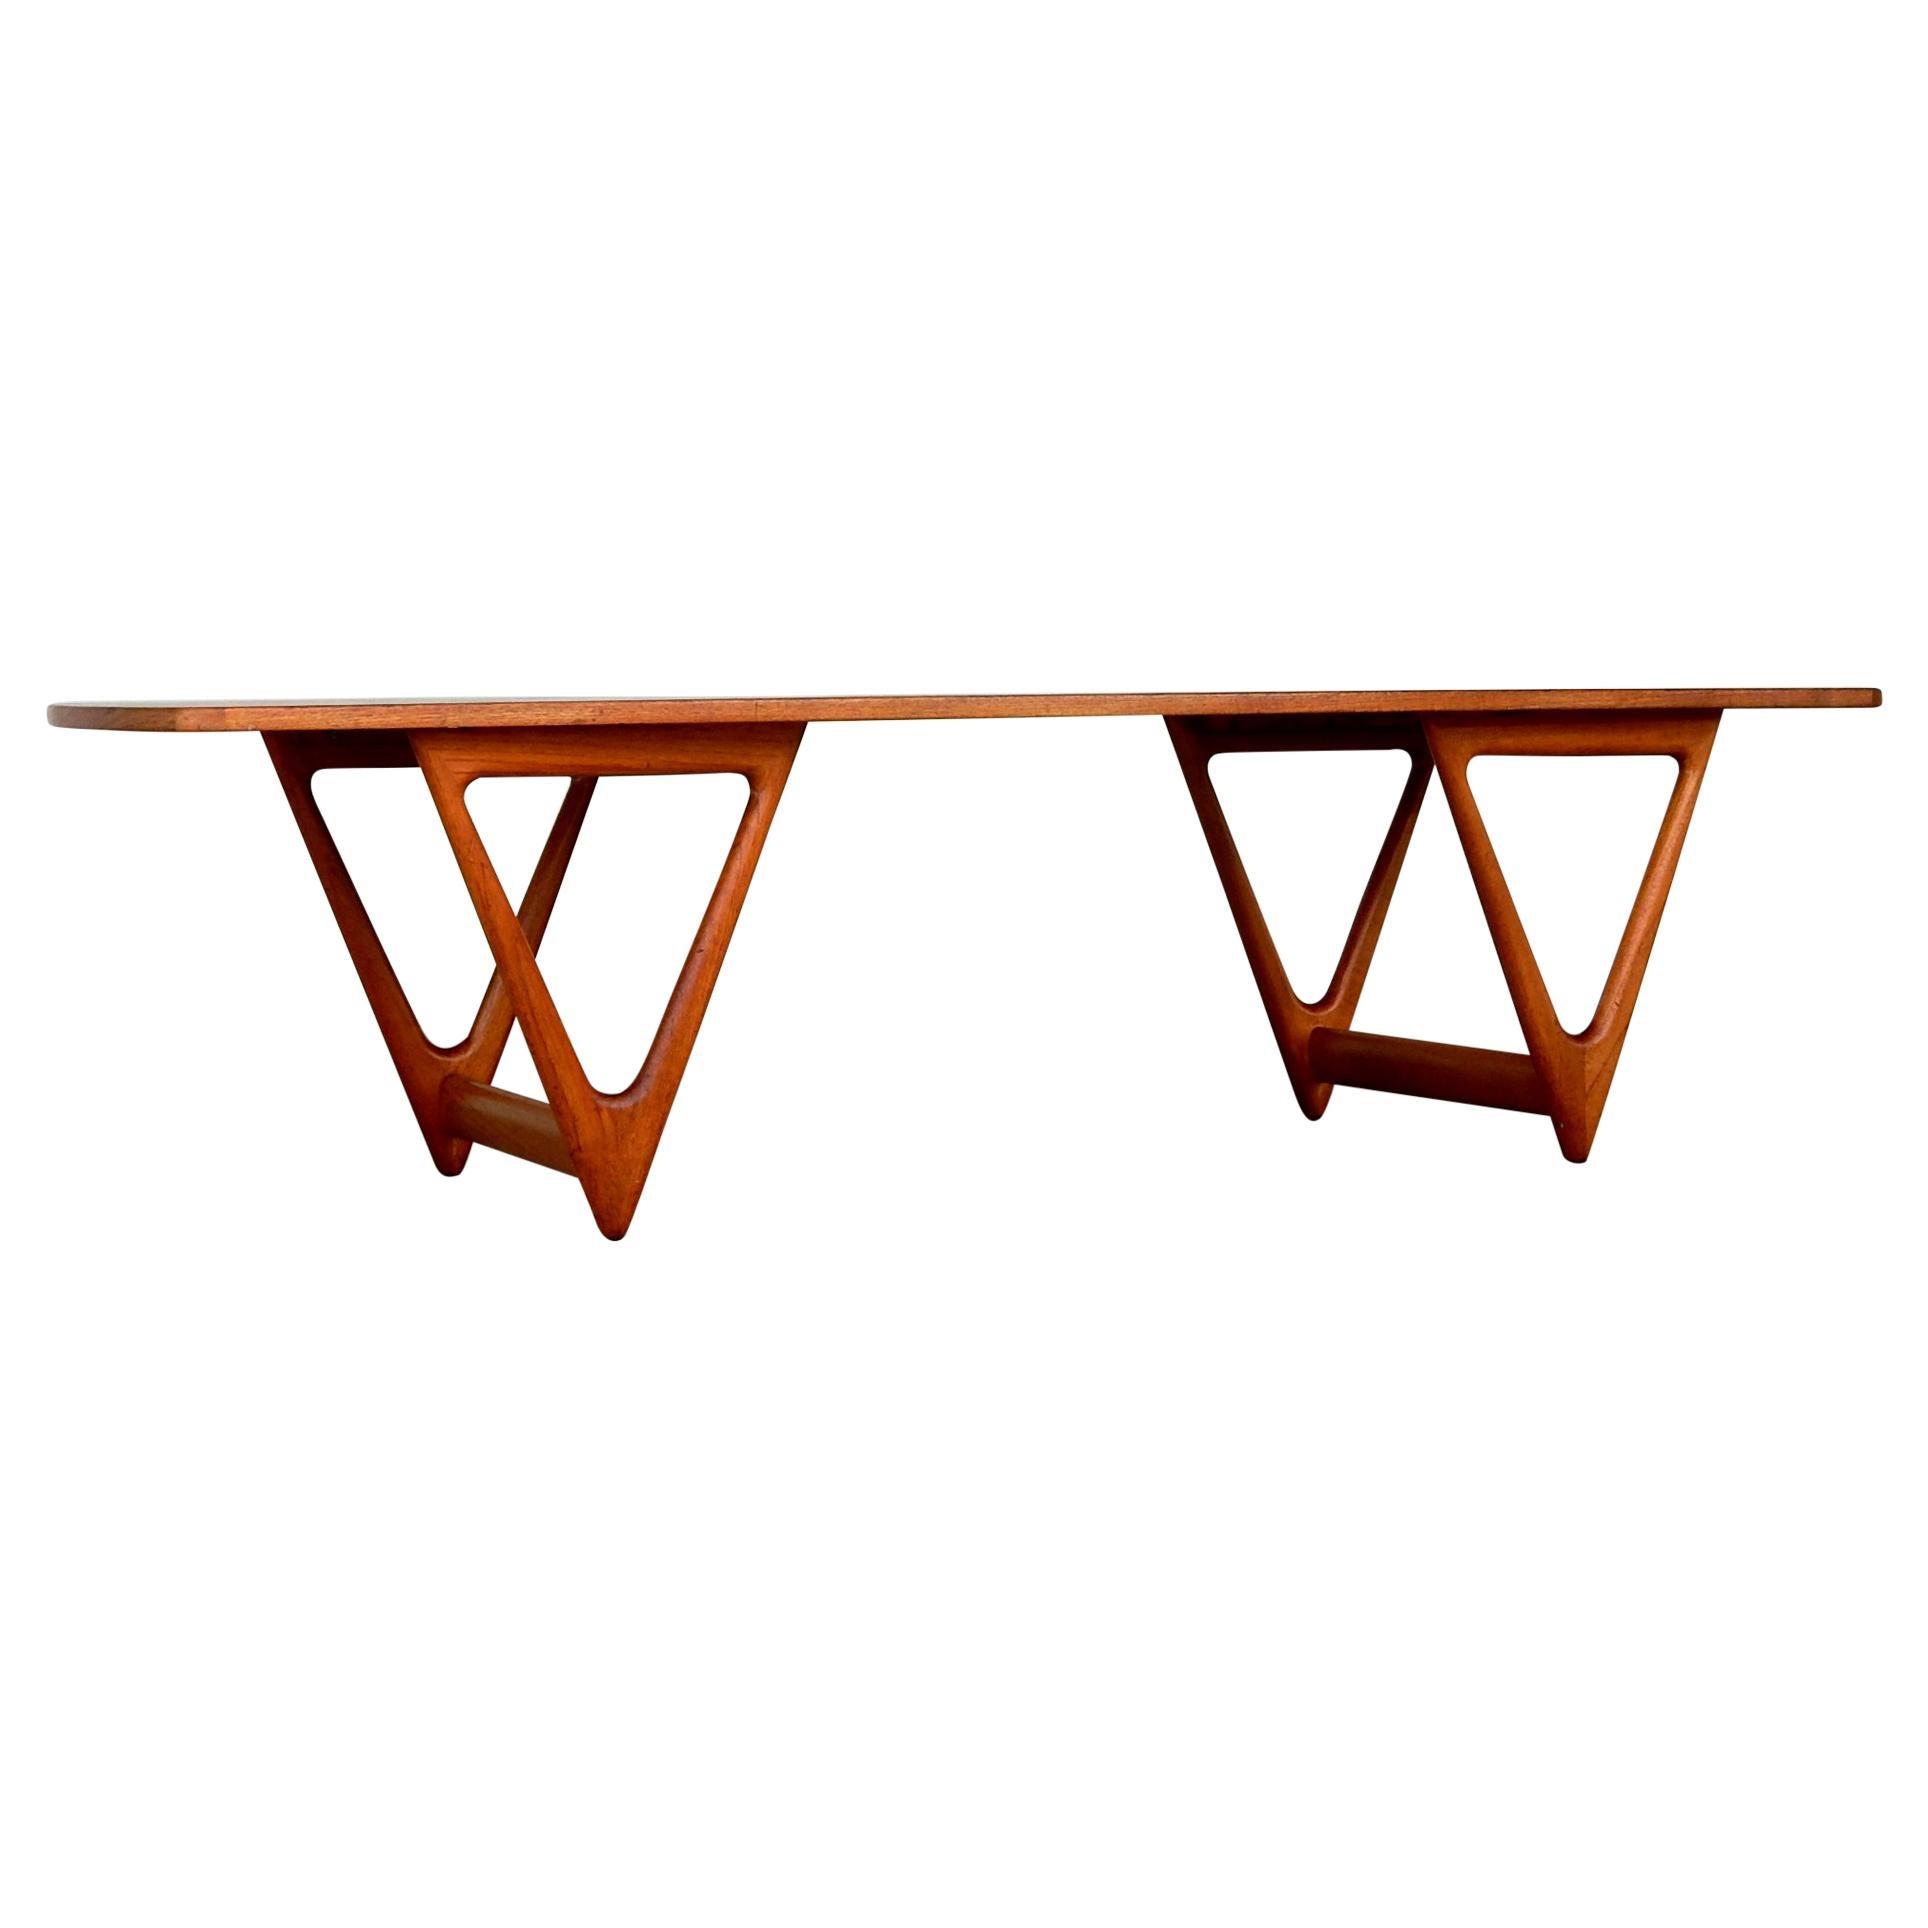 1950's Danish Modern Sculpted Leg Surfboard Cocktail Table by Kurt Østervig